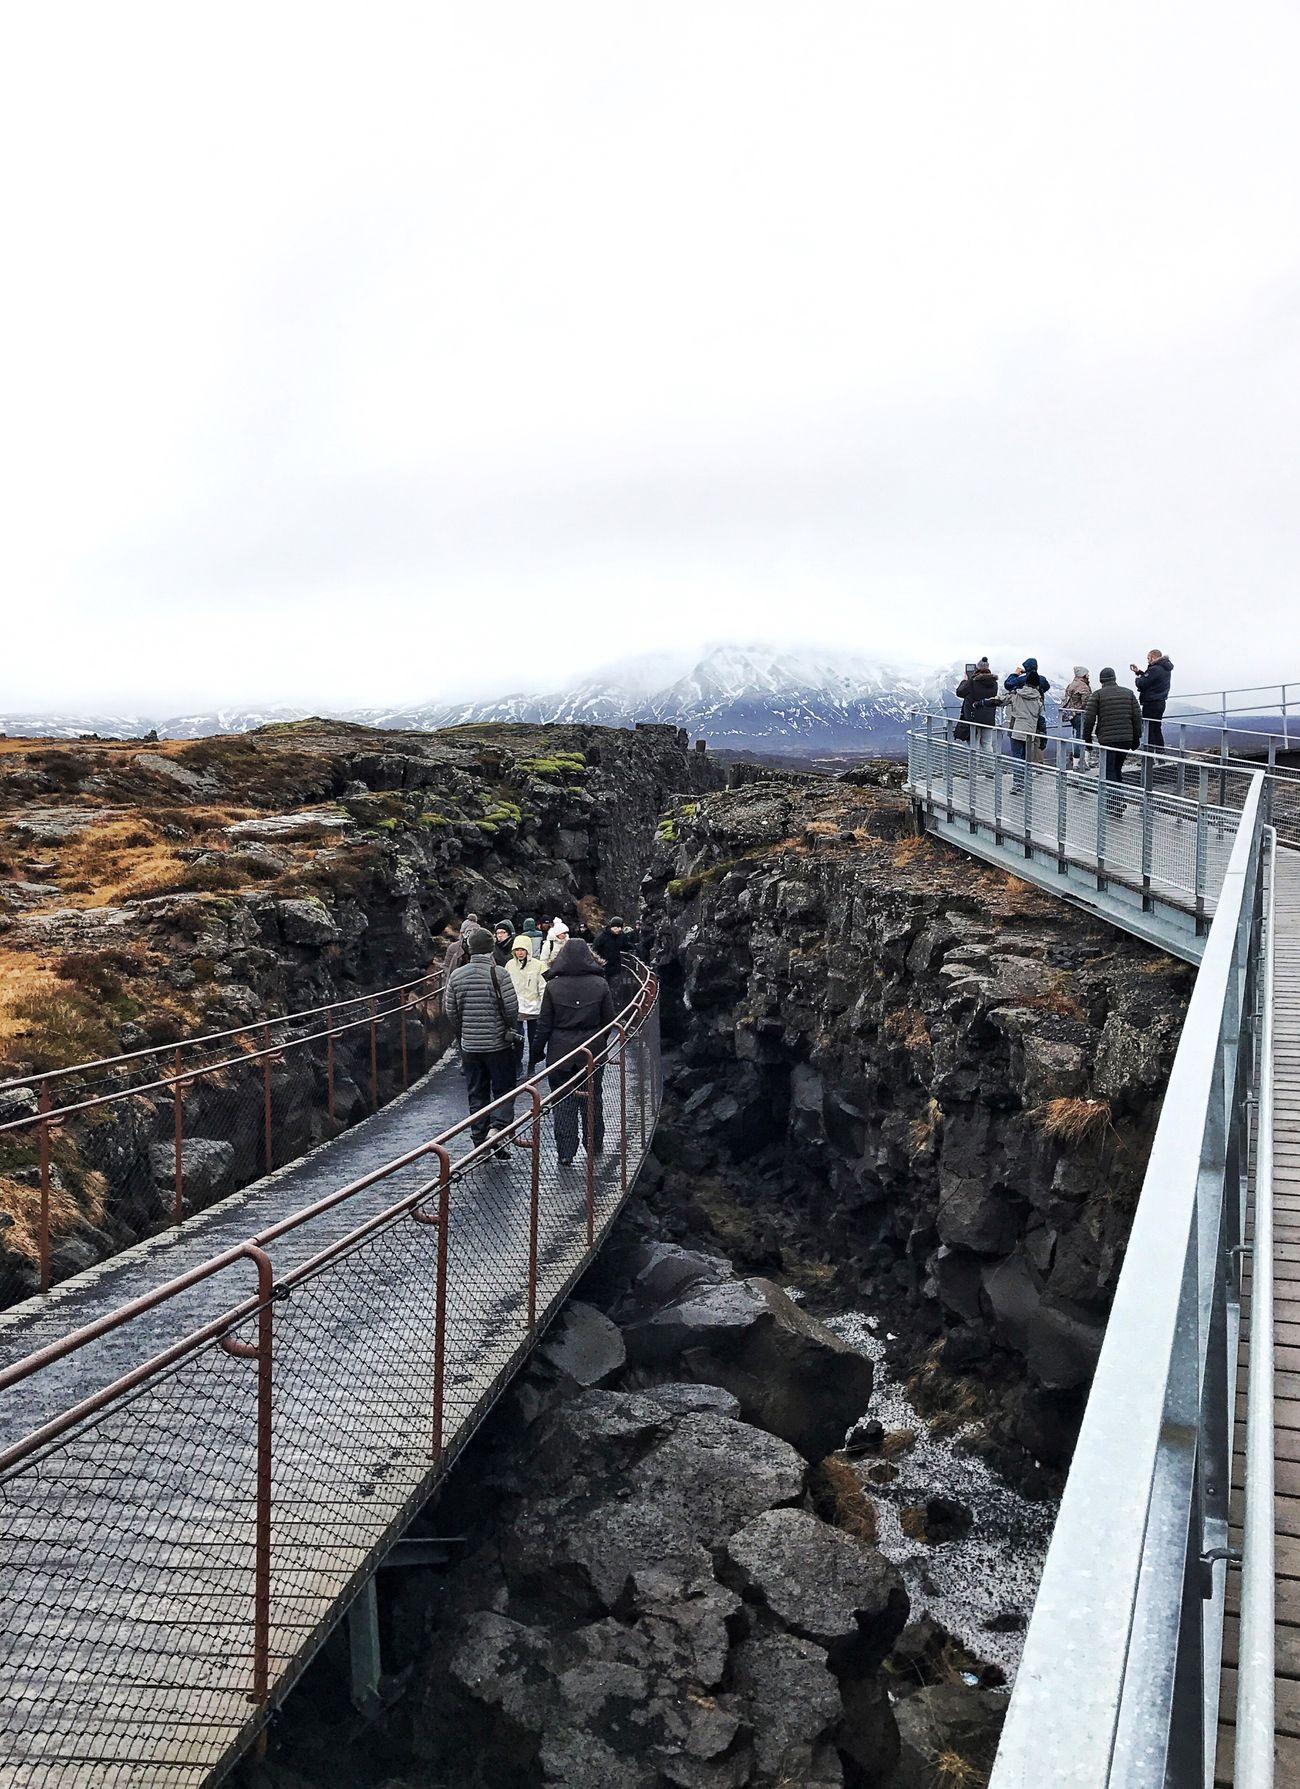 Golden Circle Iceland Mountain Thingvellir National Park Tectonicplate Fissure In Nature Tectonic Ridge